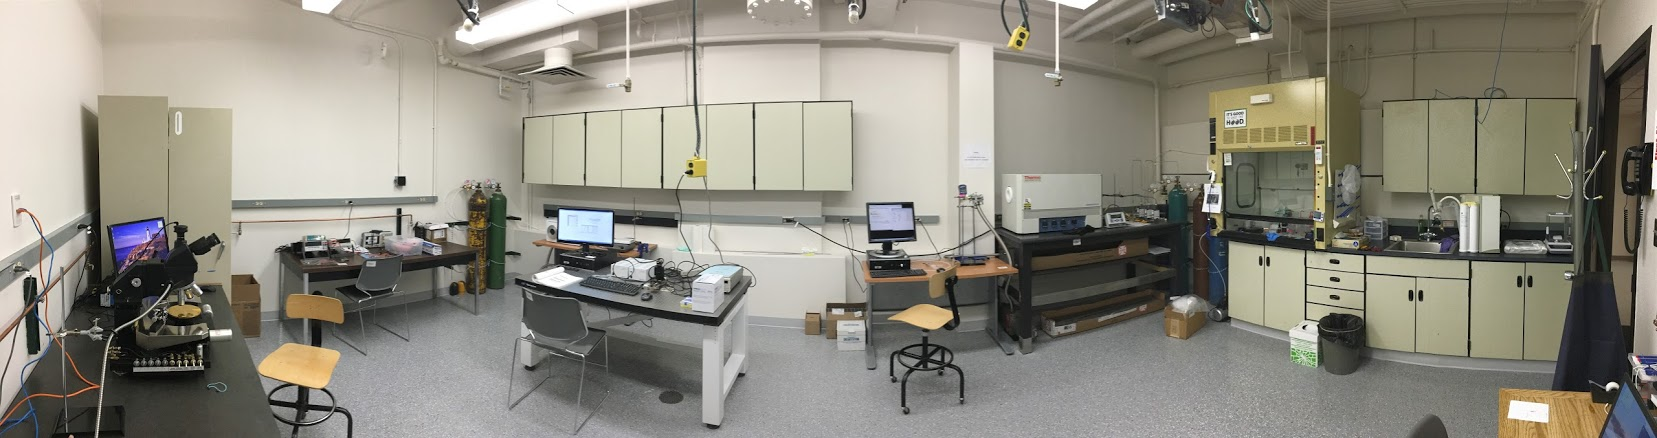 lab-view